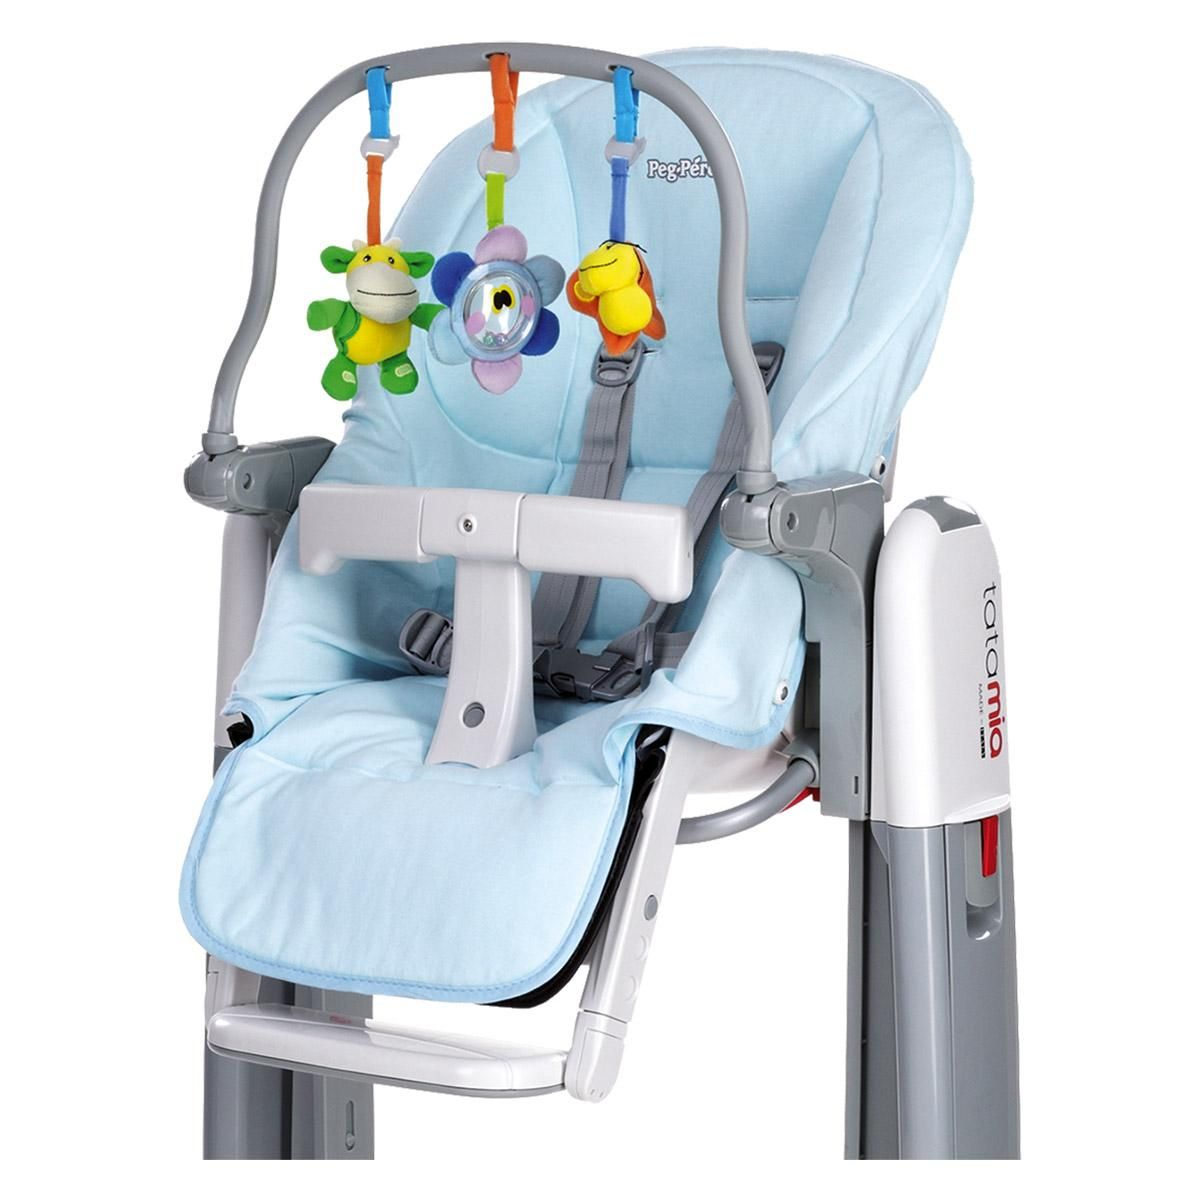 Kit Tatamia Siesta Newborn Azzuro 30169 Babycenter Hrvatska Peg Perego Baby Center Baby High Chair